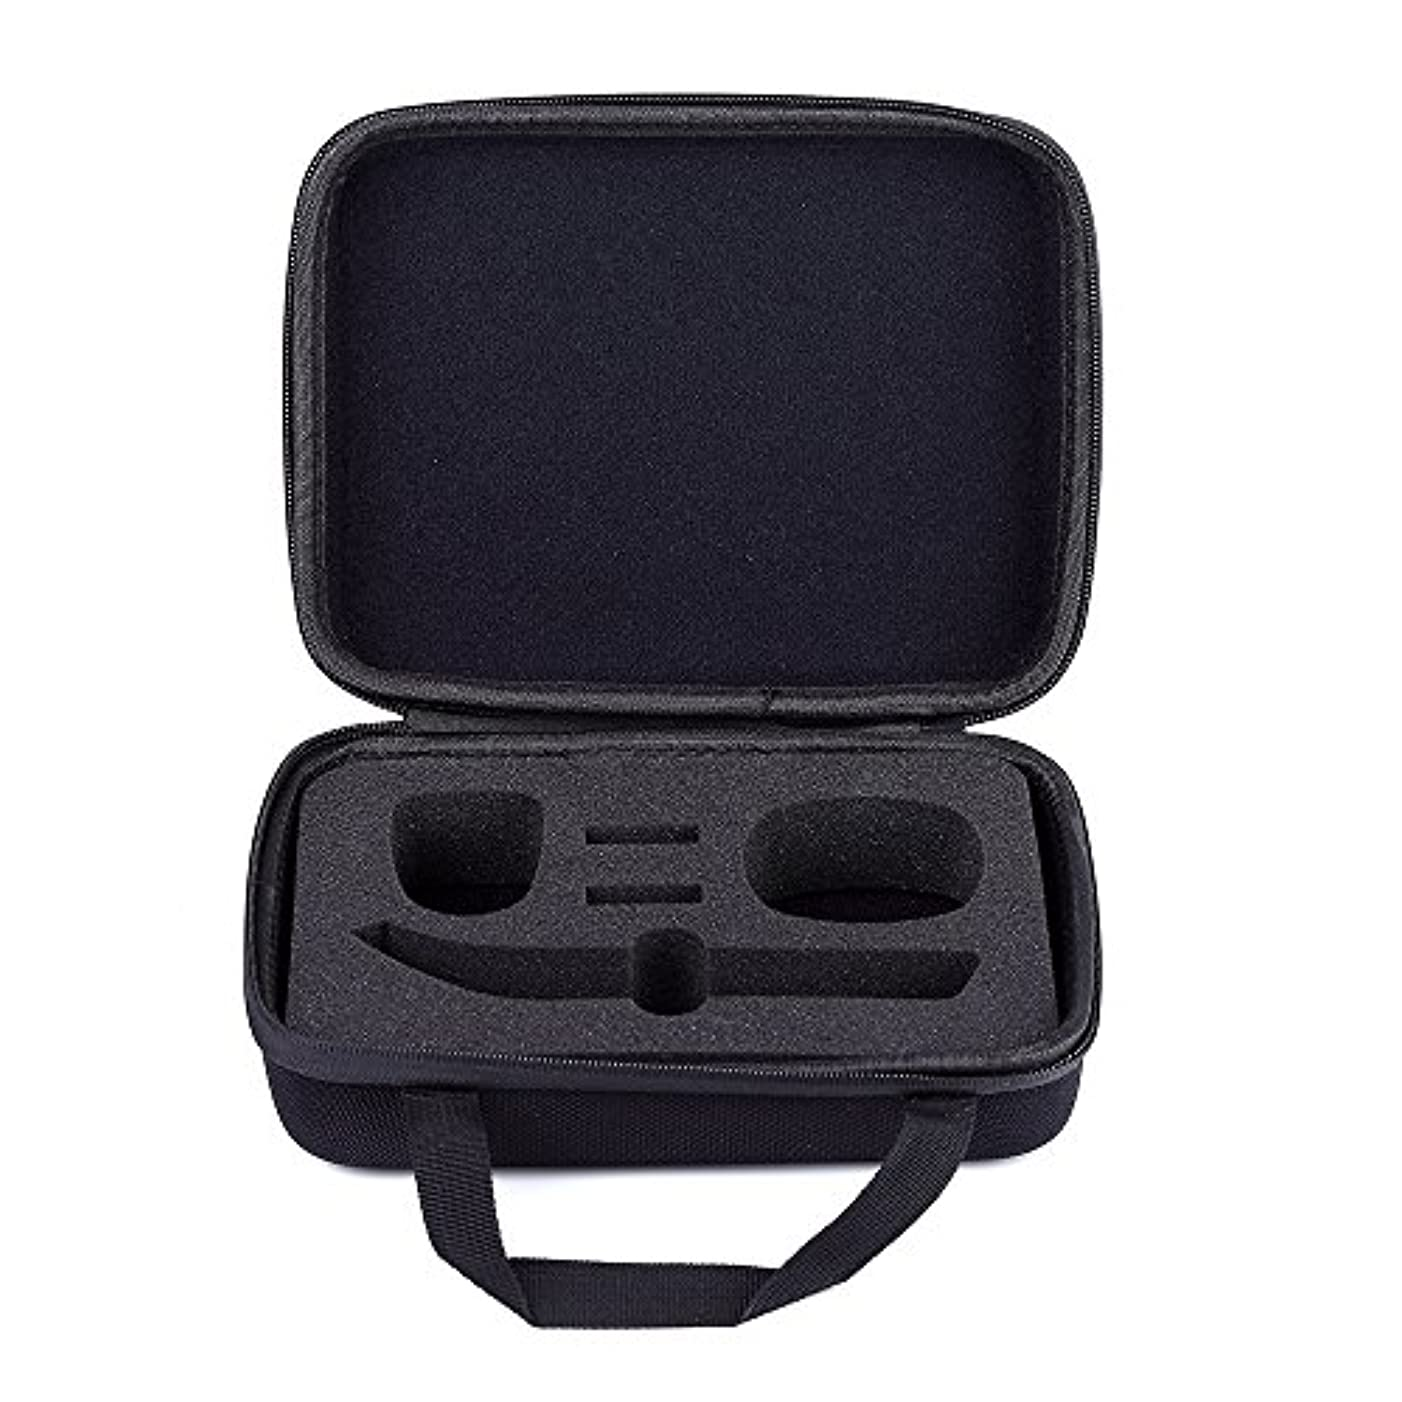 ACAMPTAR トラベルのハードバッグ、携帯用ケース、Norelco Oneblade Pro用、転倒防止、防水、実用的なPhilipsシェーバー用の収納ボックス